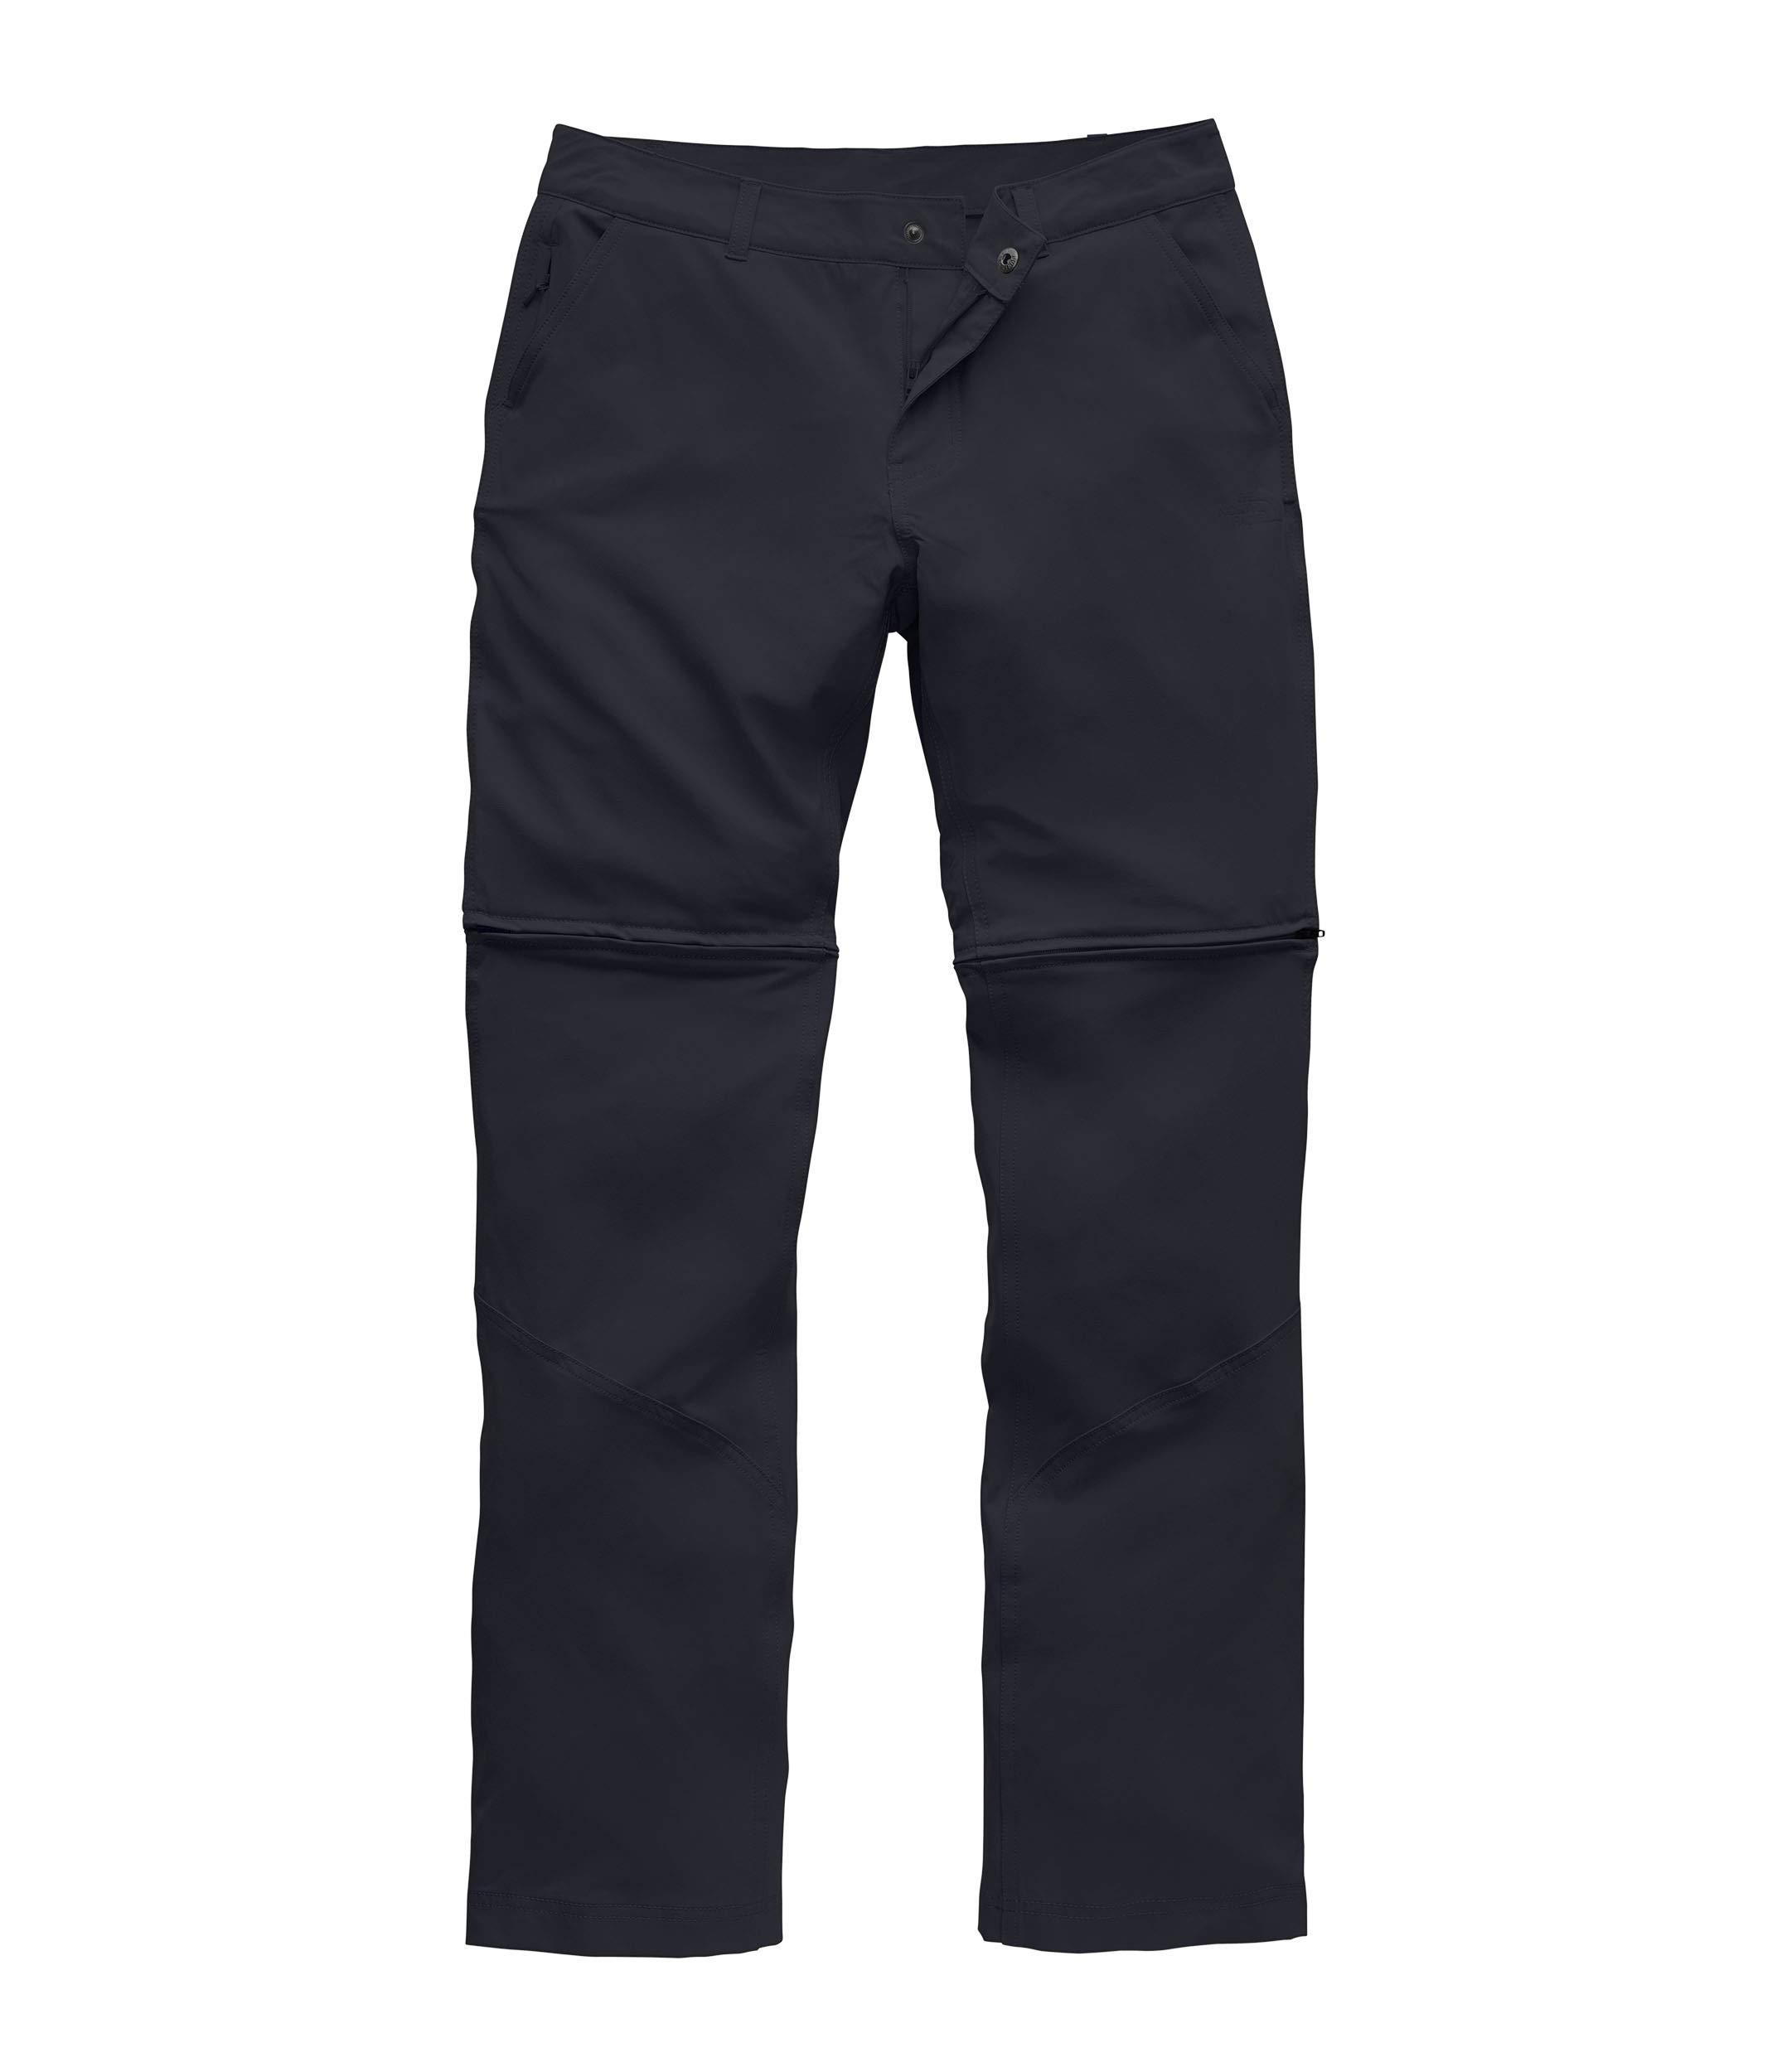 The North Face Women's Paramount Convertible Pant, Urban Navy, Size 2 Short